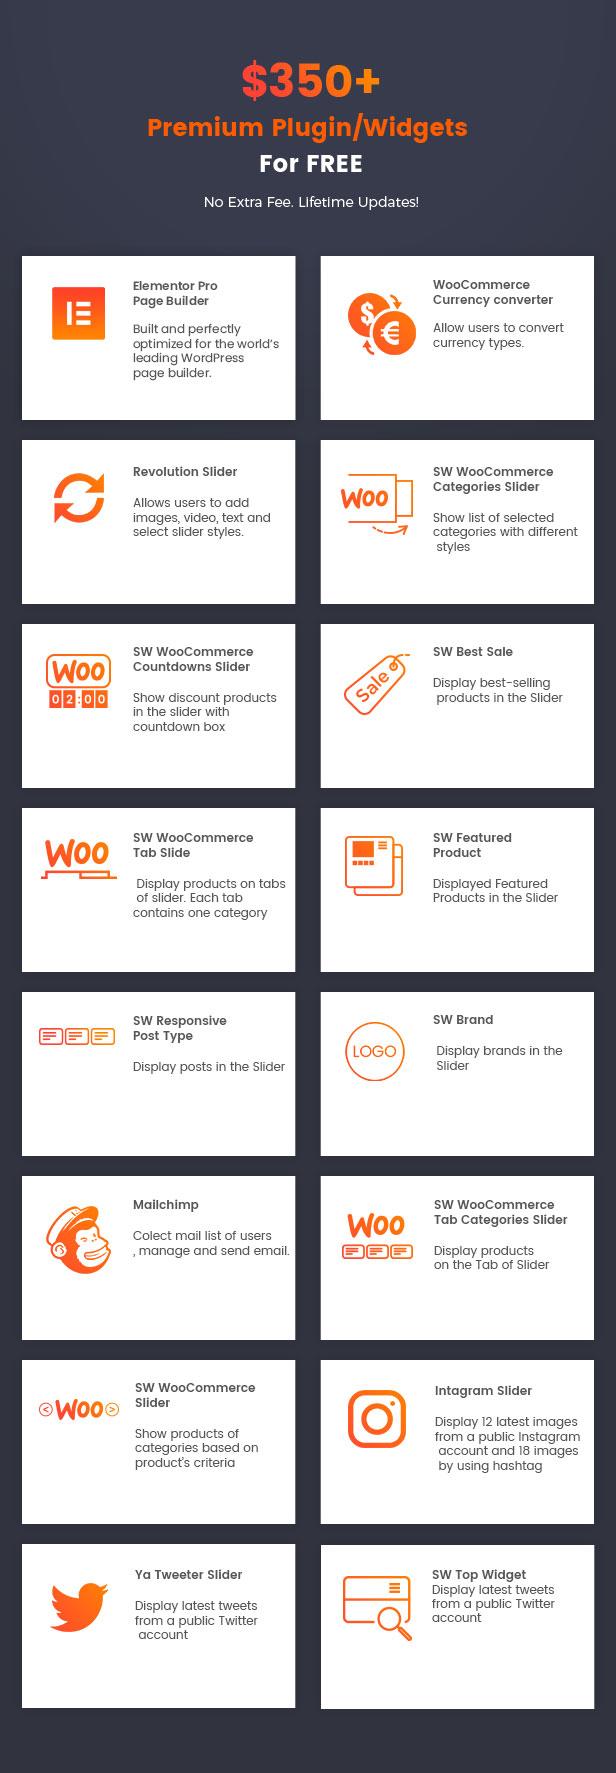 22 premiumplugins - eMarket - Multi Vendor MarketPlace Elementor WordPress Theme (34+ Homepages & 3 Mobile Layouts)